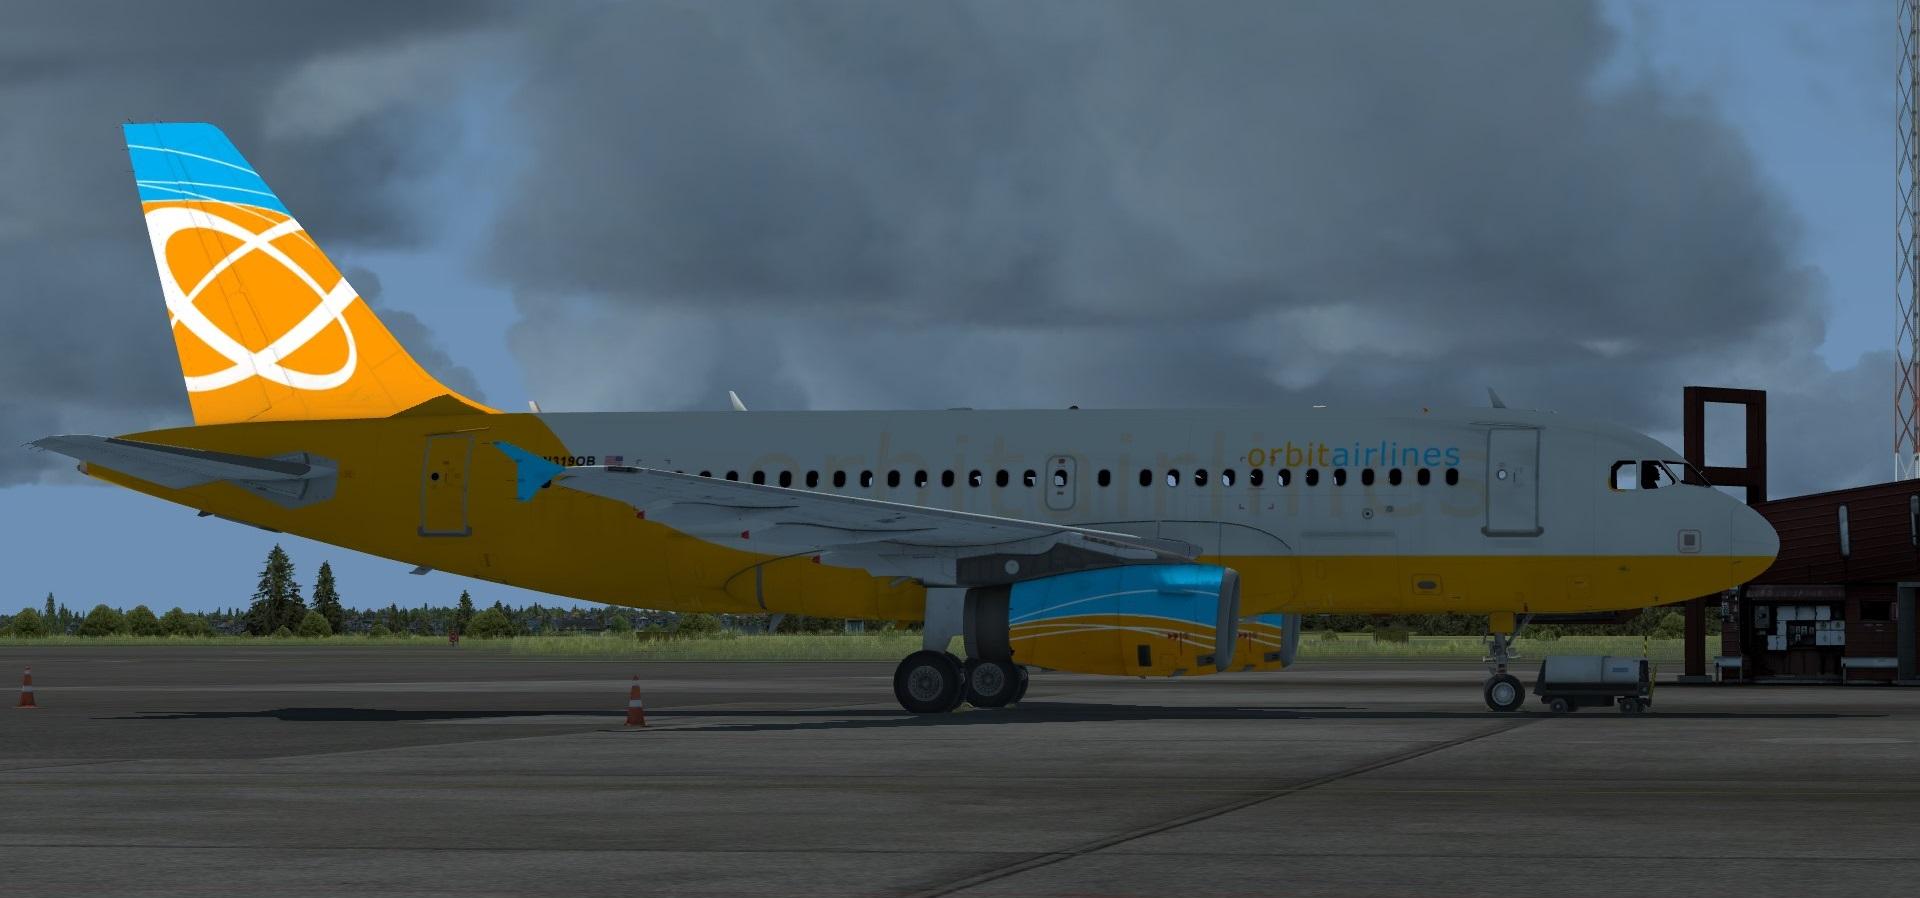 Orbit Airlines Flight 1315 | Microsoft Flight Simulator Wiki